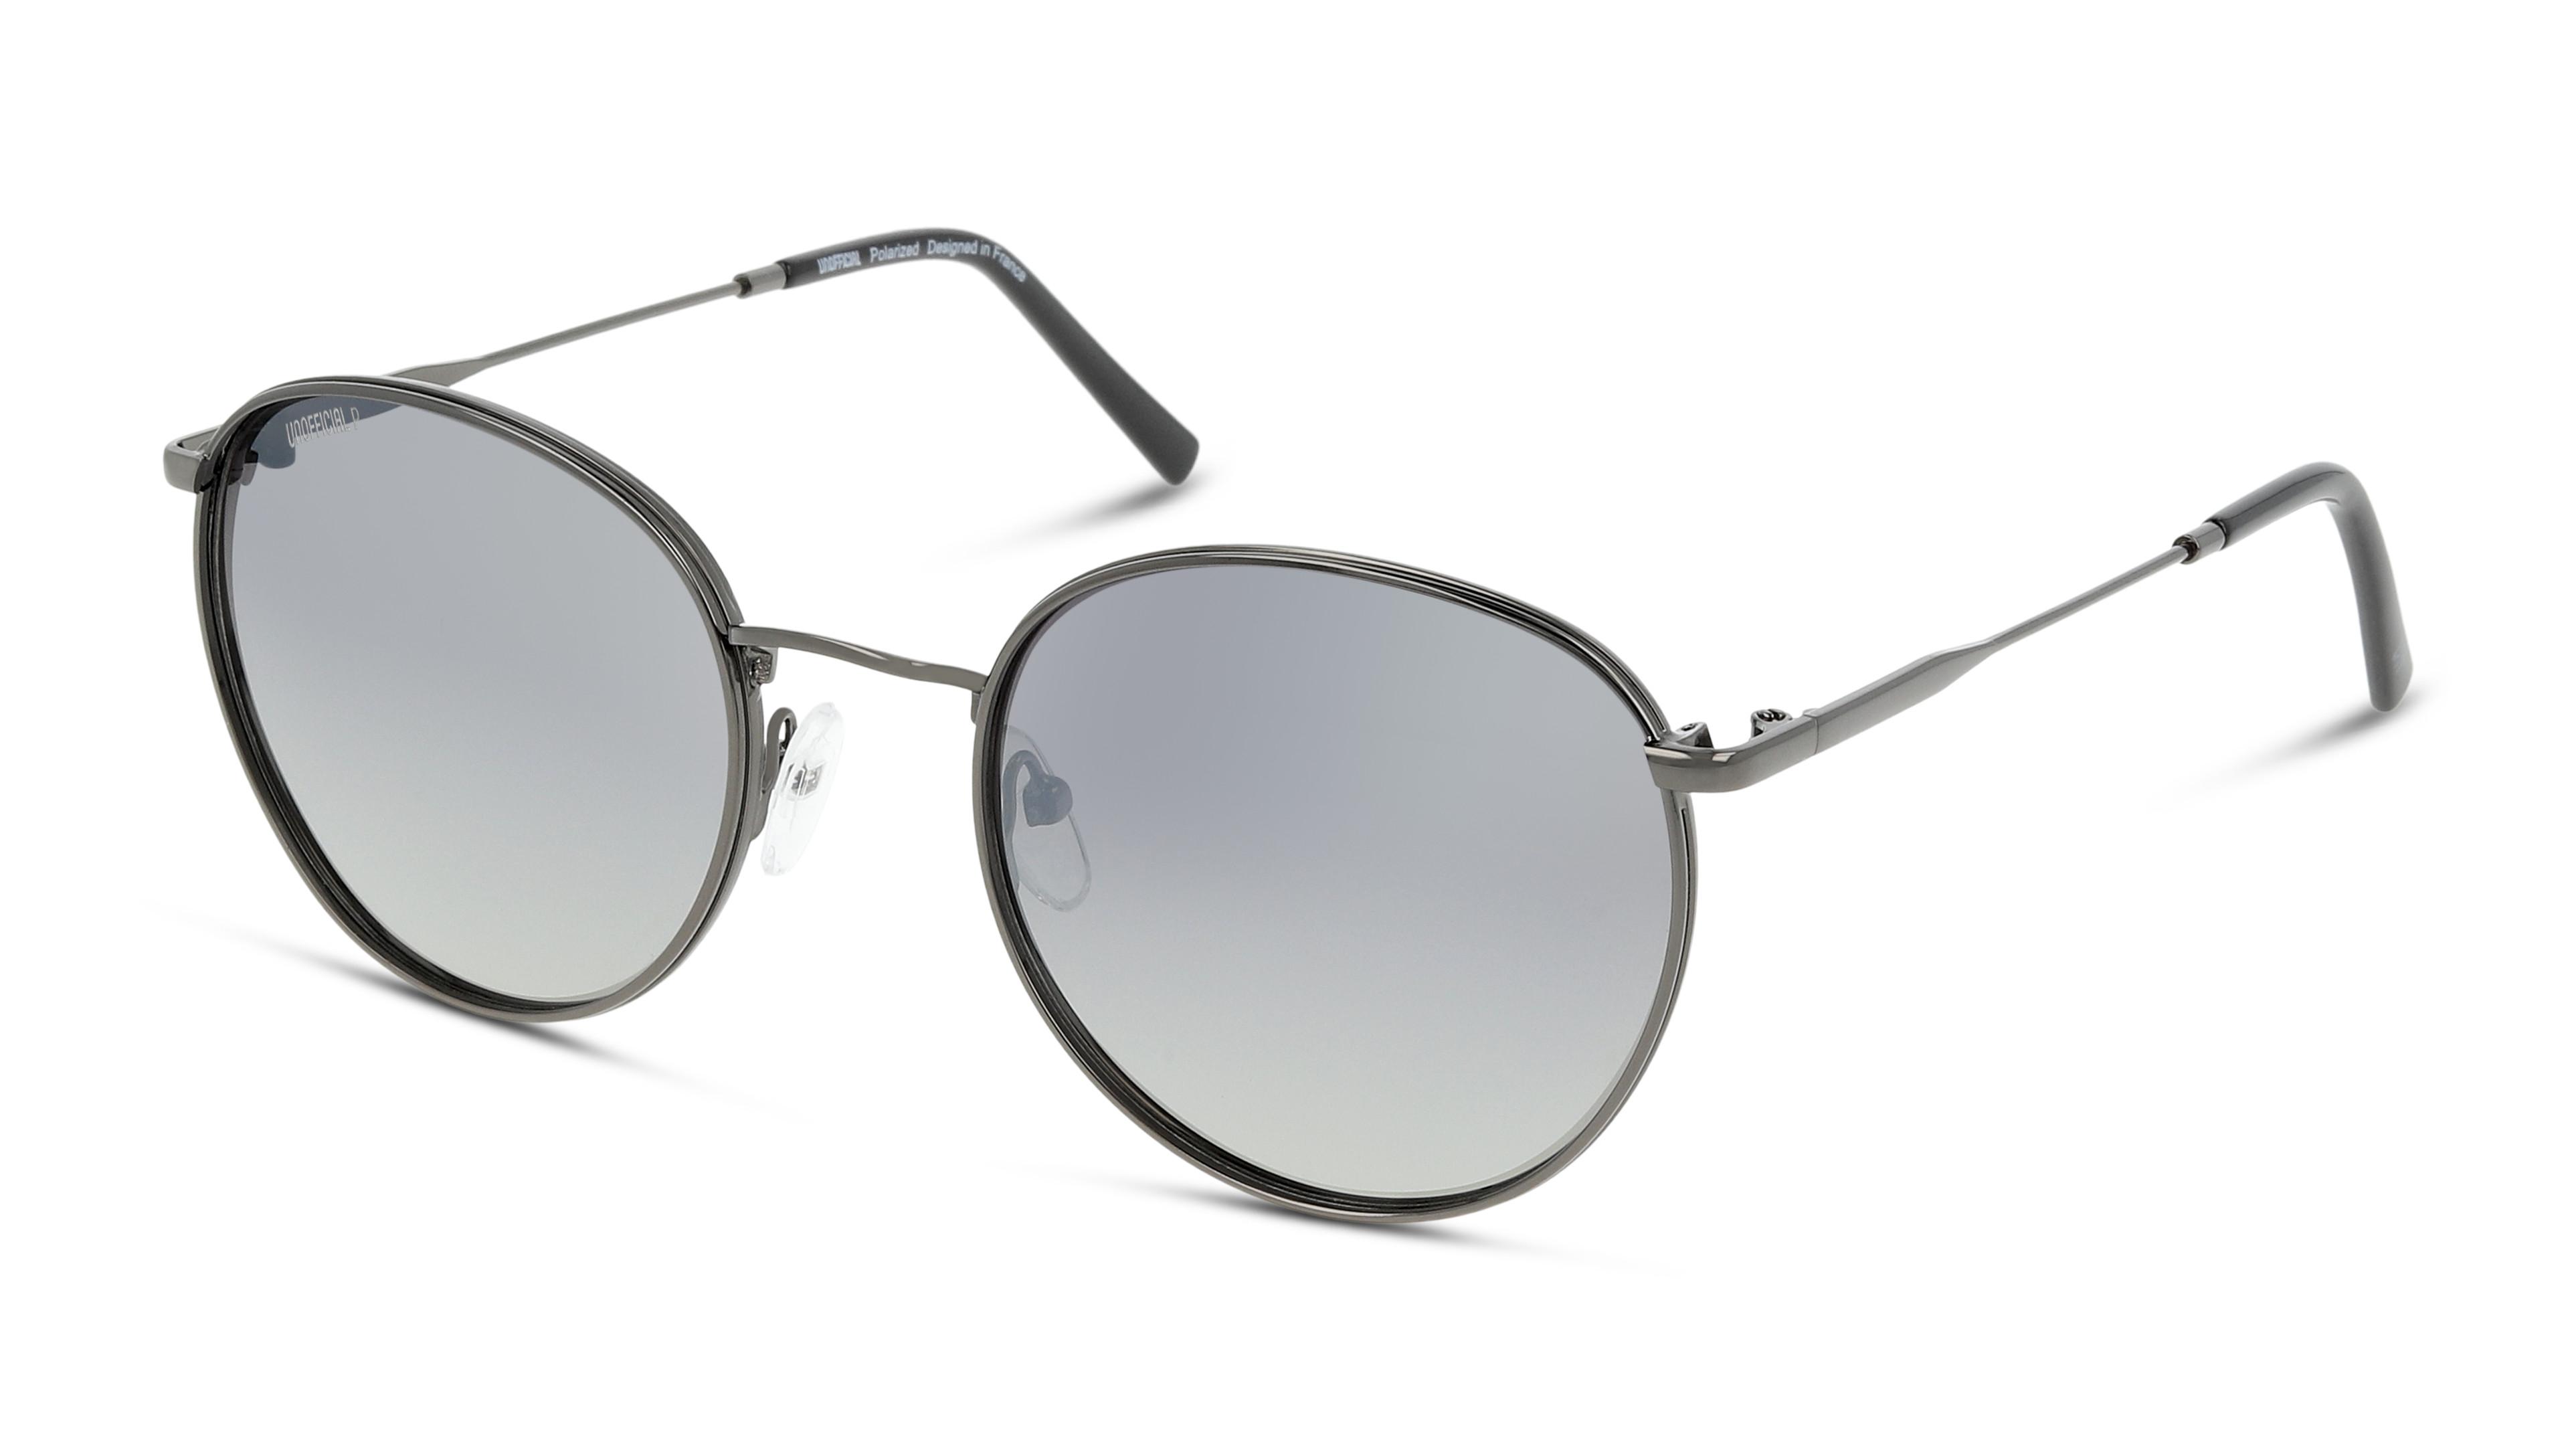 8719154730665-angle-03-unofficial-unsu0030p-eyewear-grey-silver